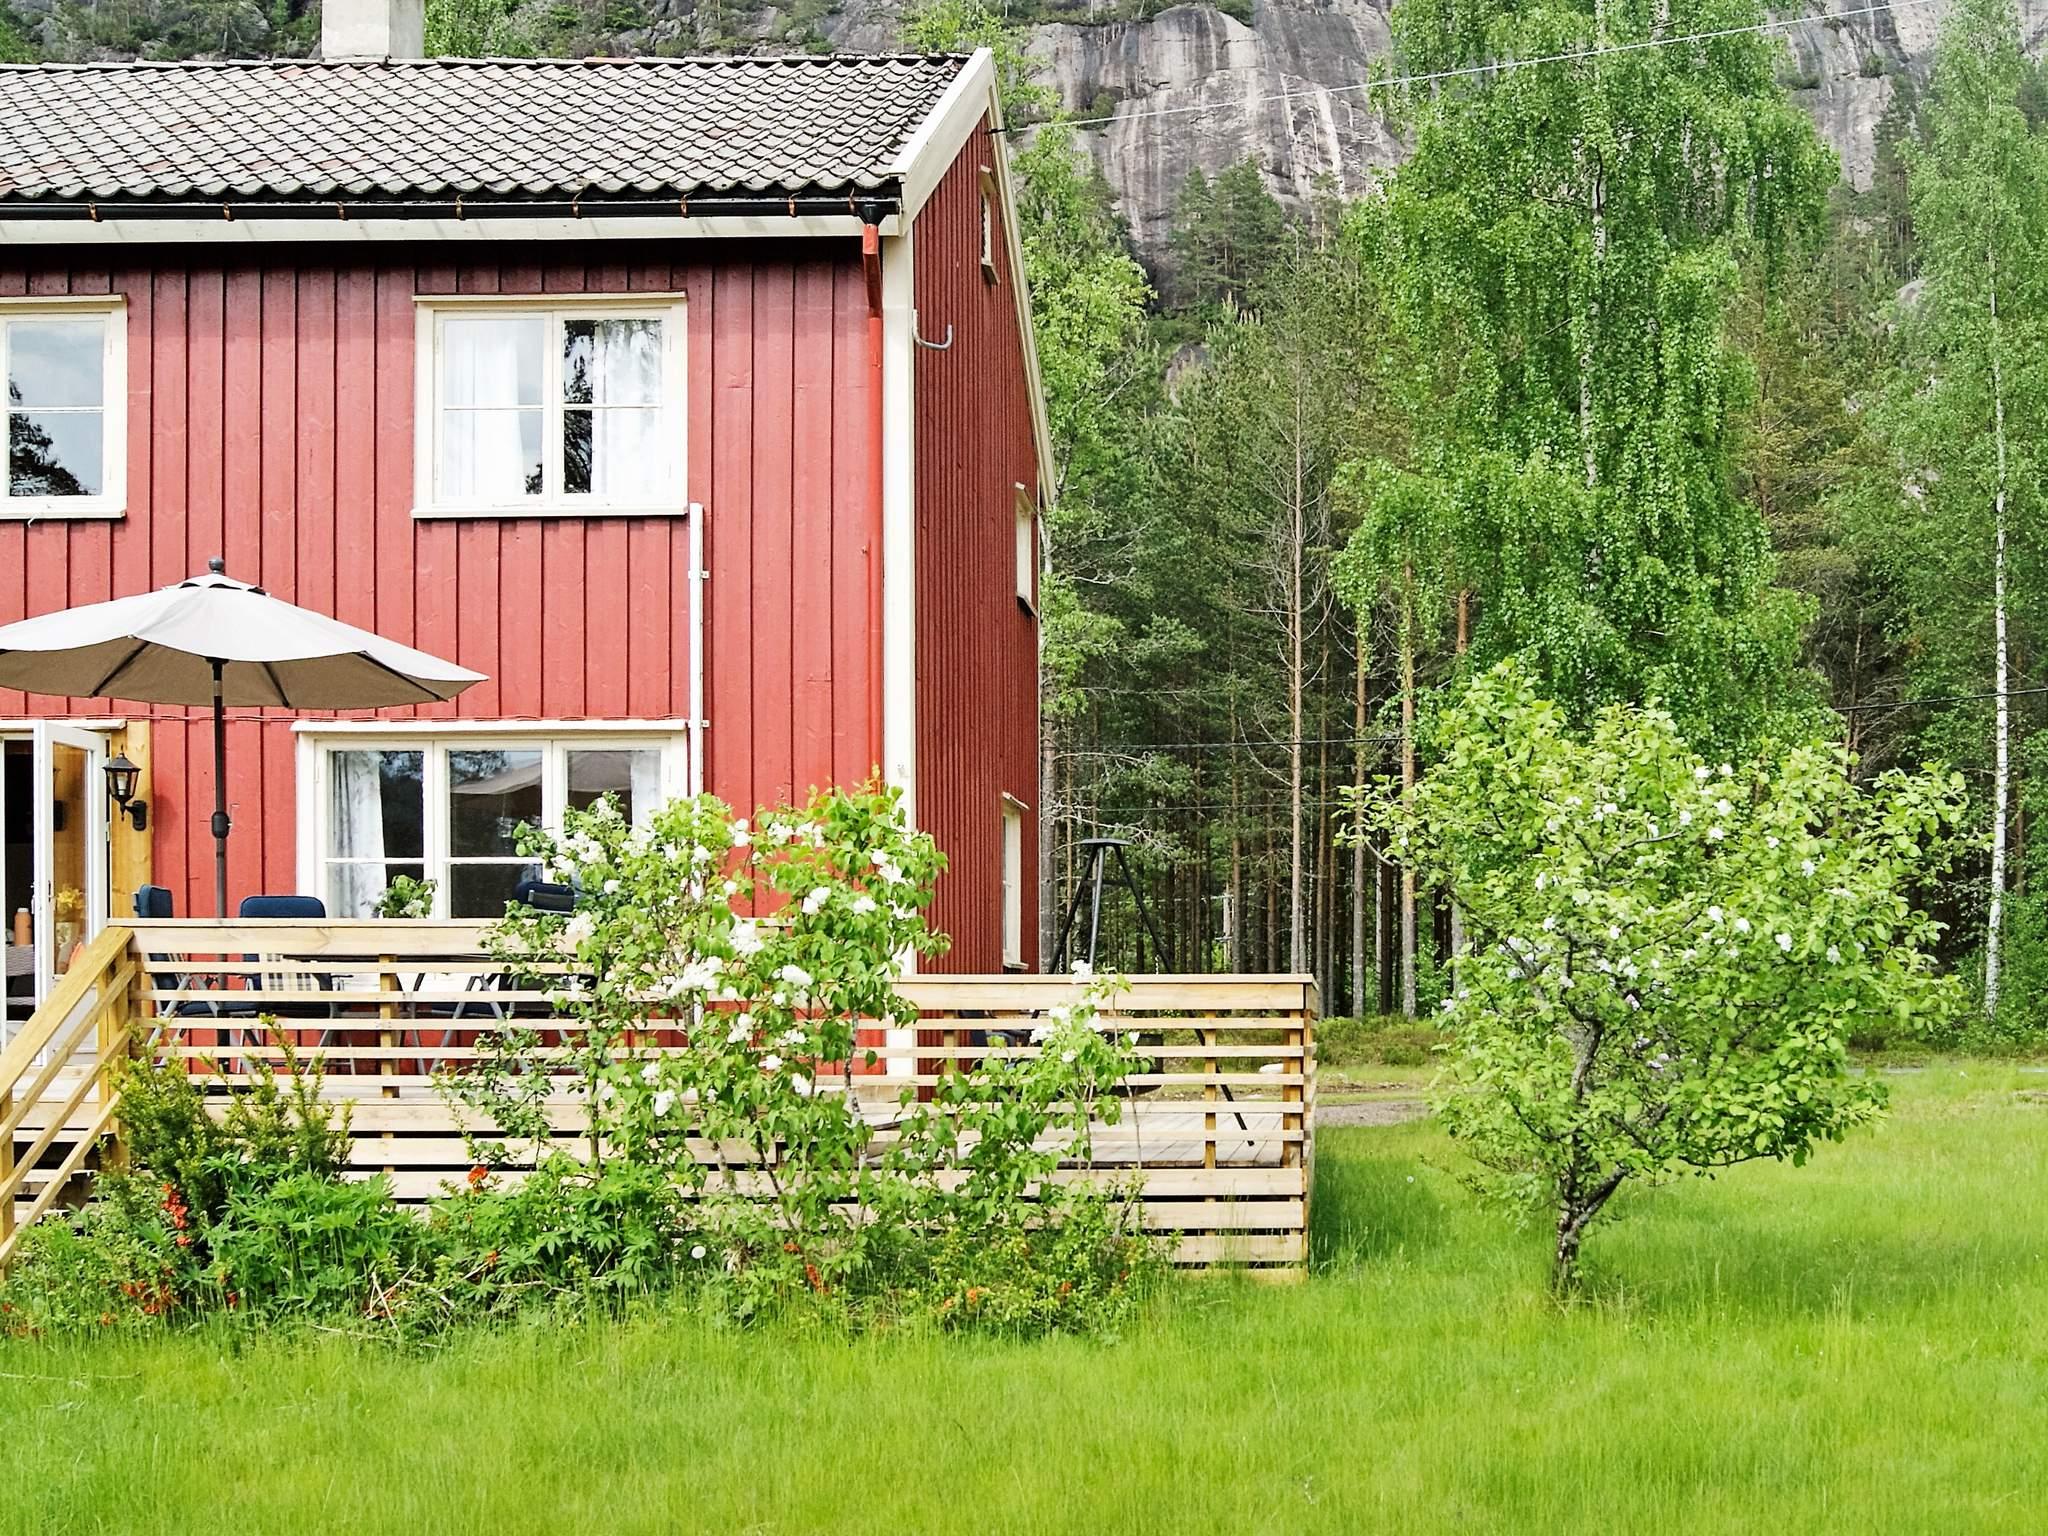 Ferienhaus Eikhom (85019), Treungen, , Ostnorwegen, Norwegen, Bild 7